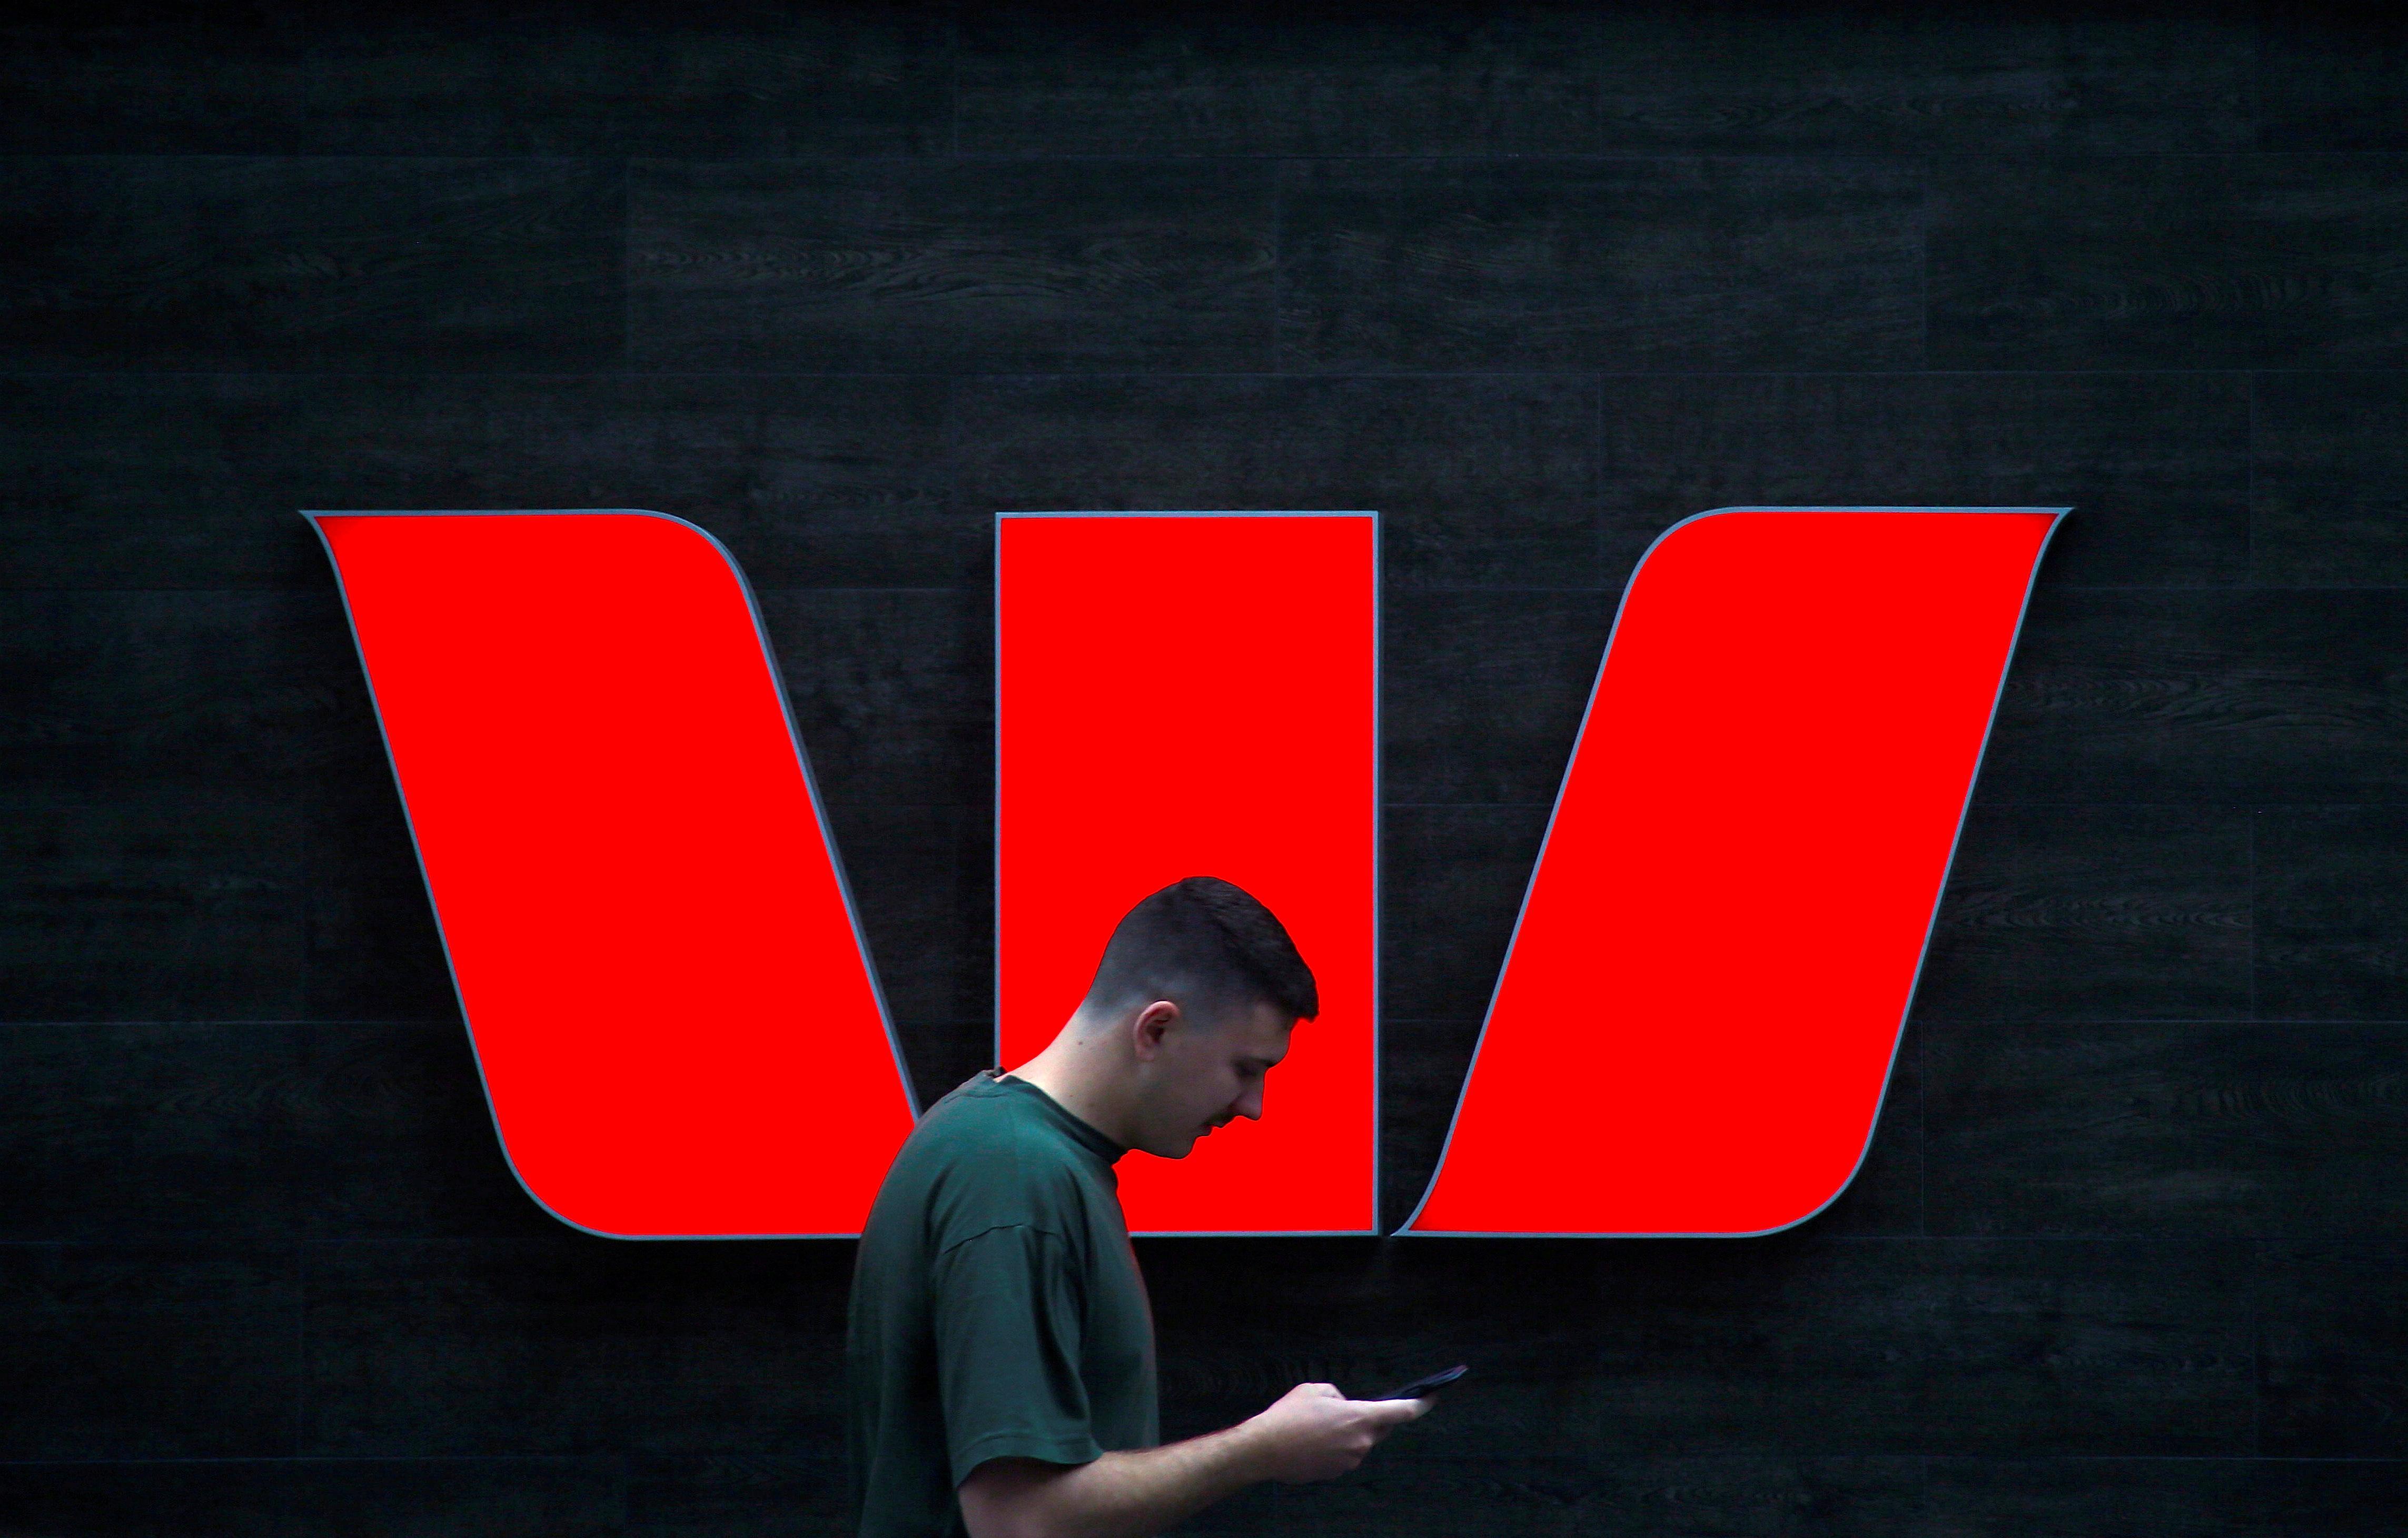 In rare win for regulators, Australia's Westpac loses case over...